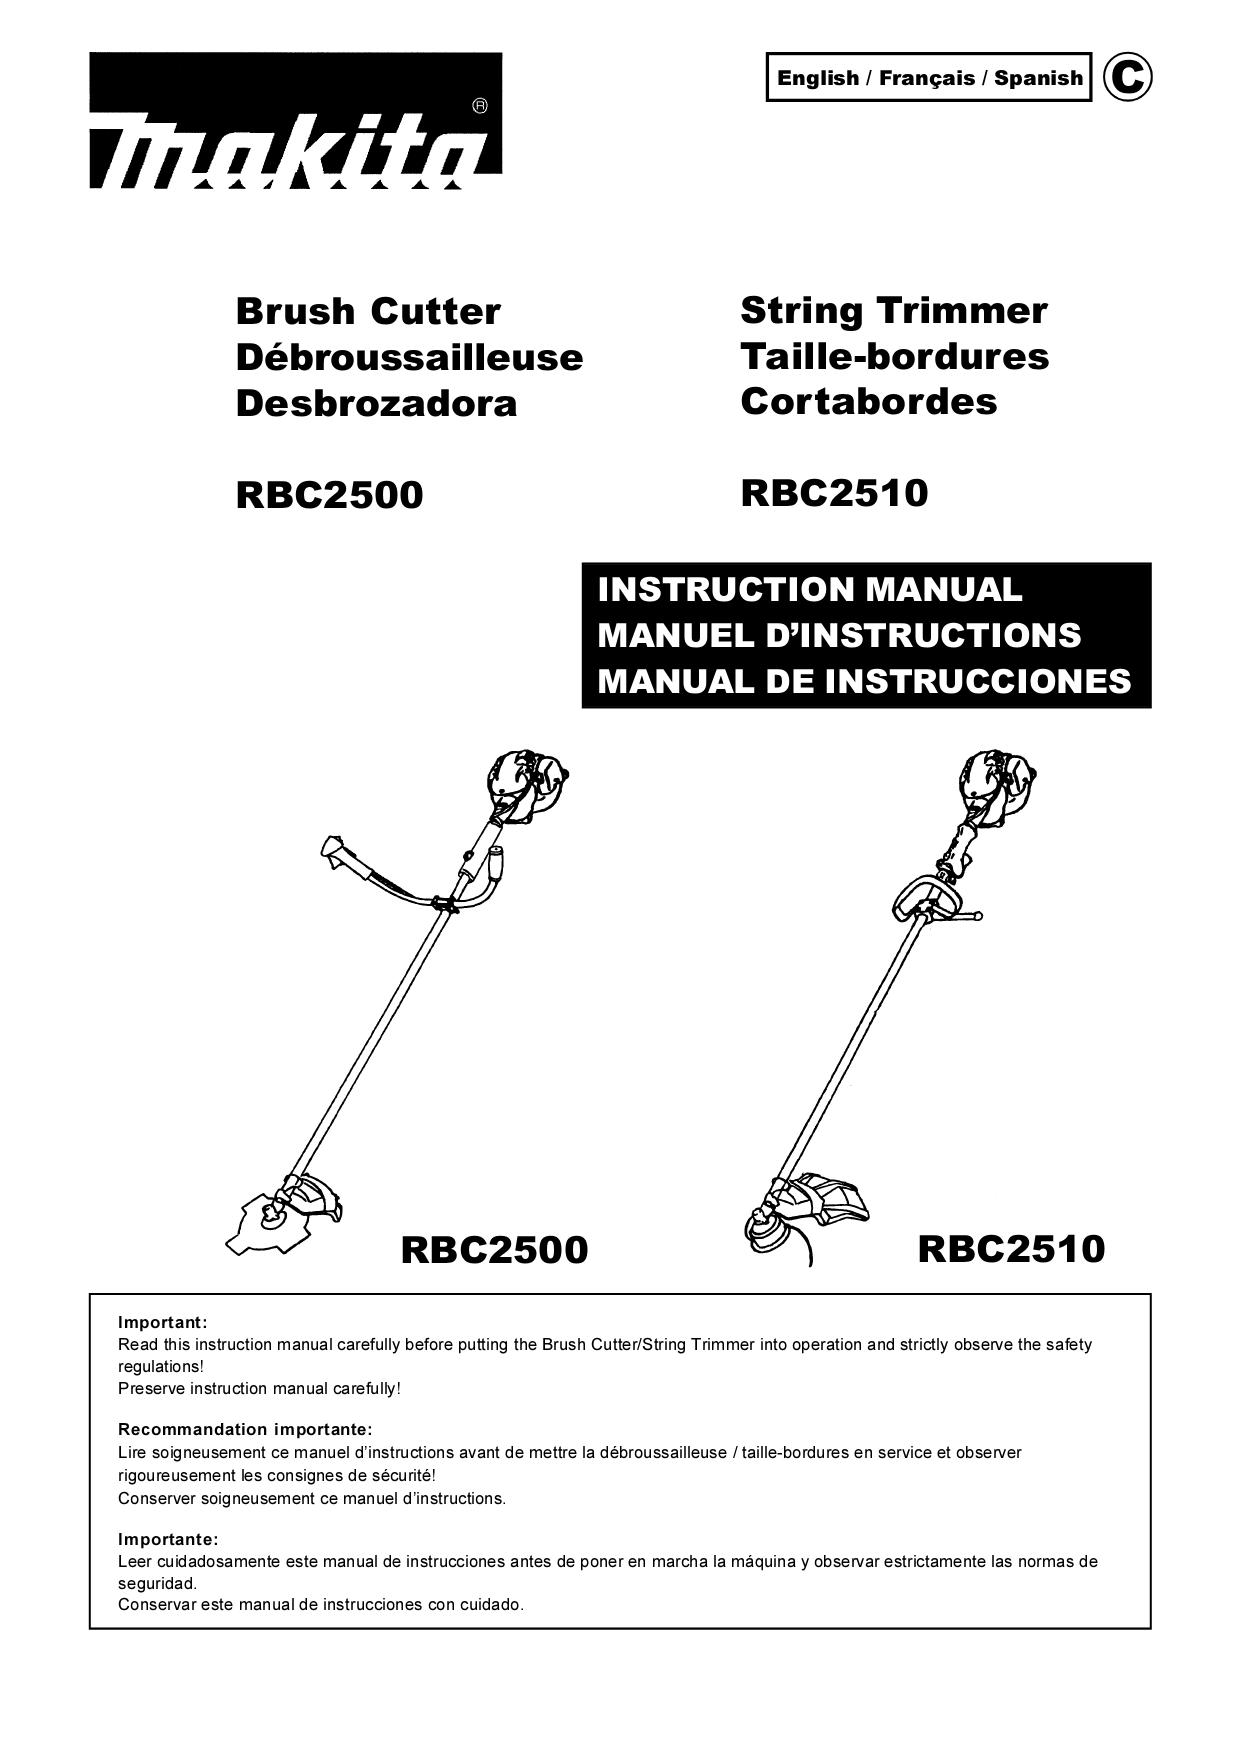 download free pdf for makita rbc2510 string trimmer other manual rh umlib com makita owners manual for miter saw ls1214fl makita owners manual for miter saw ls1214fl